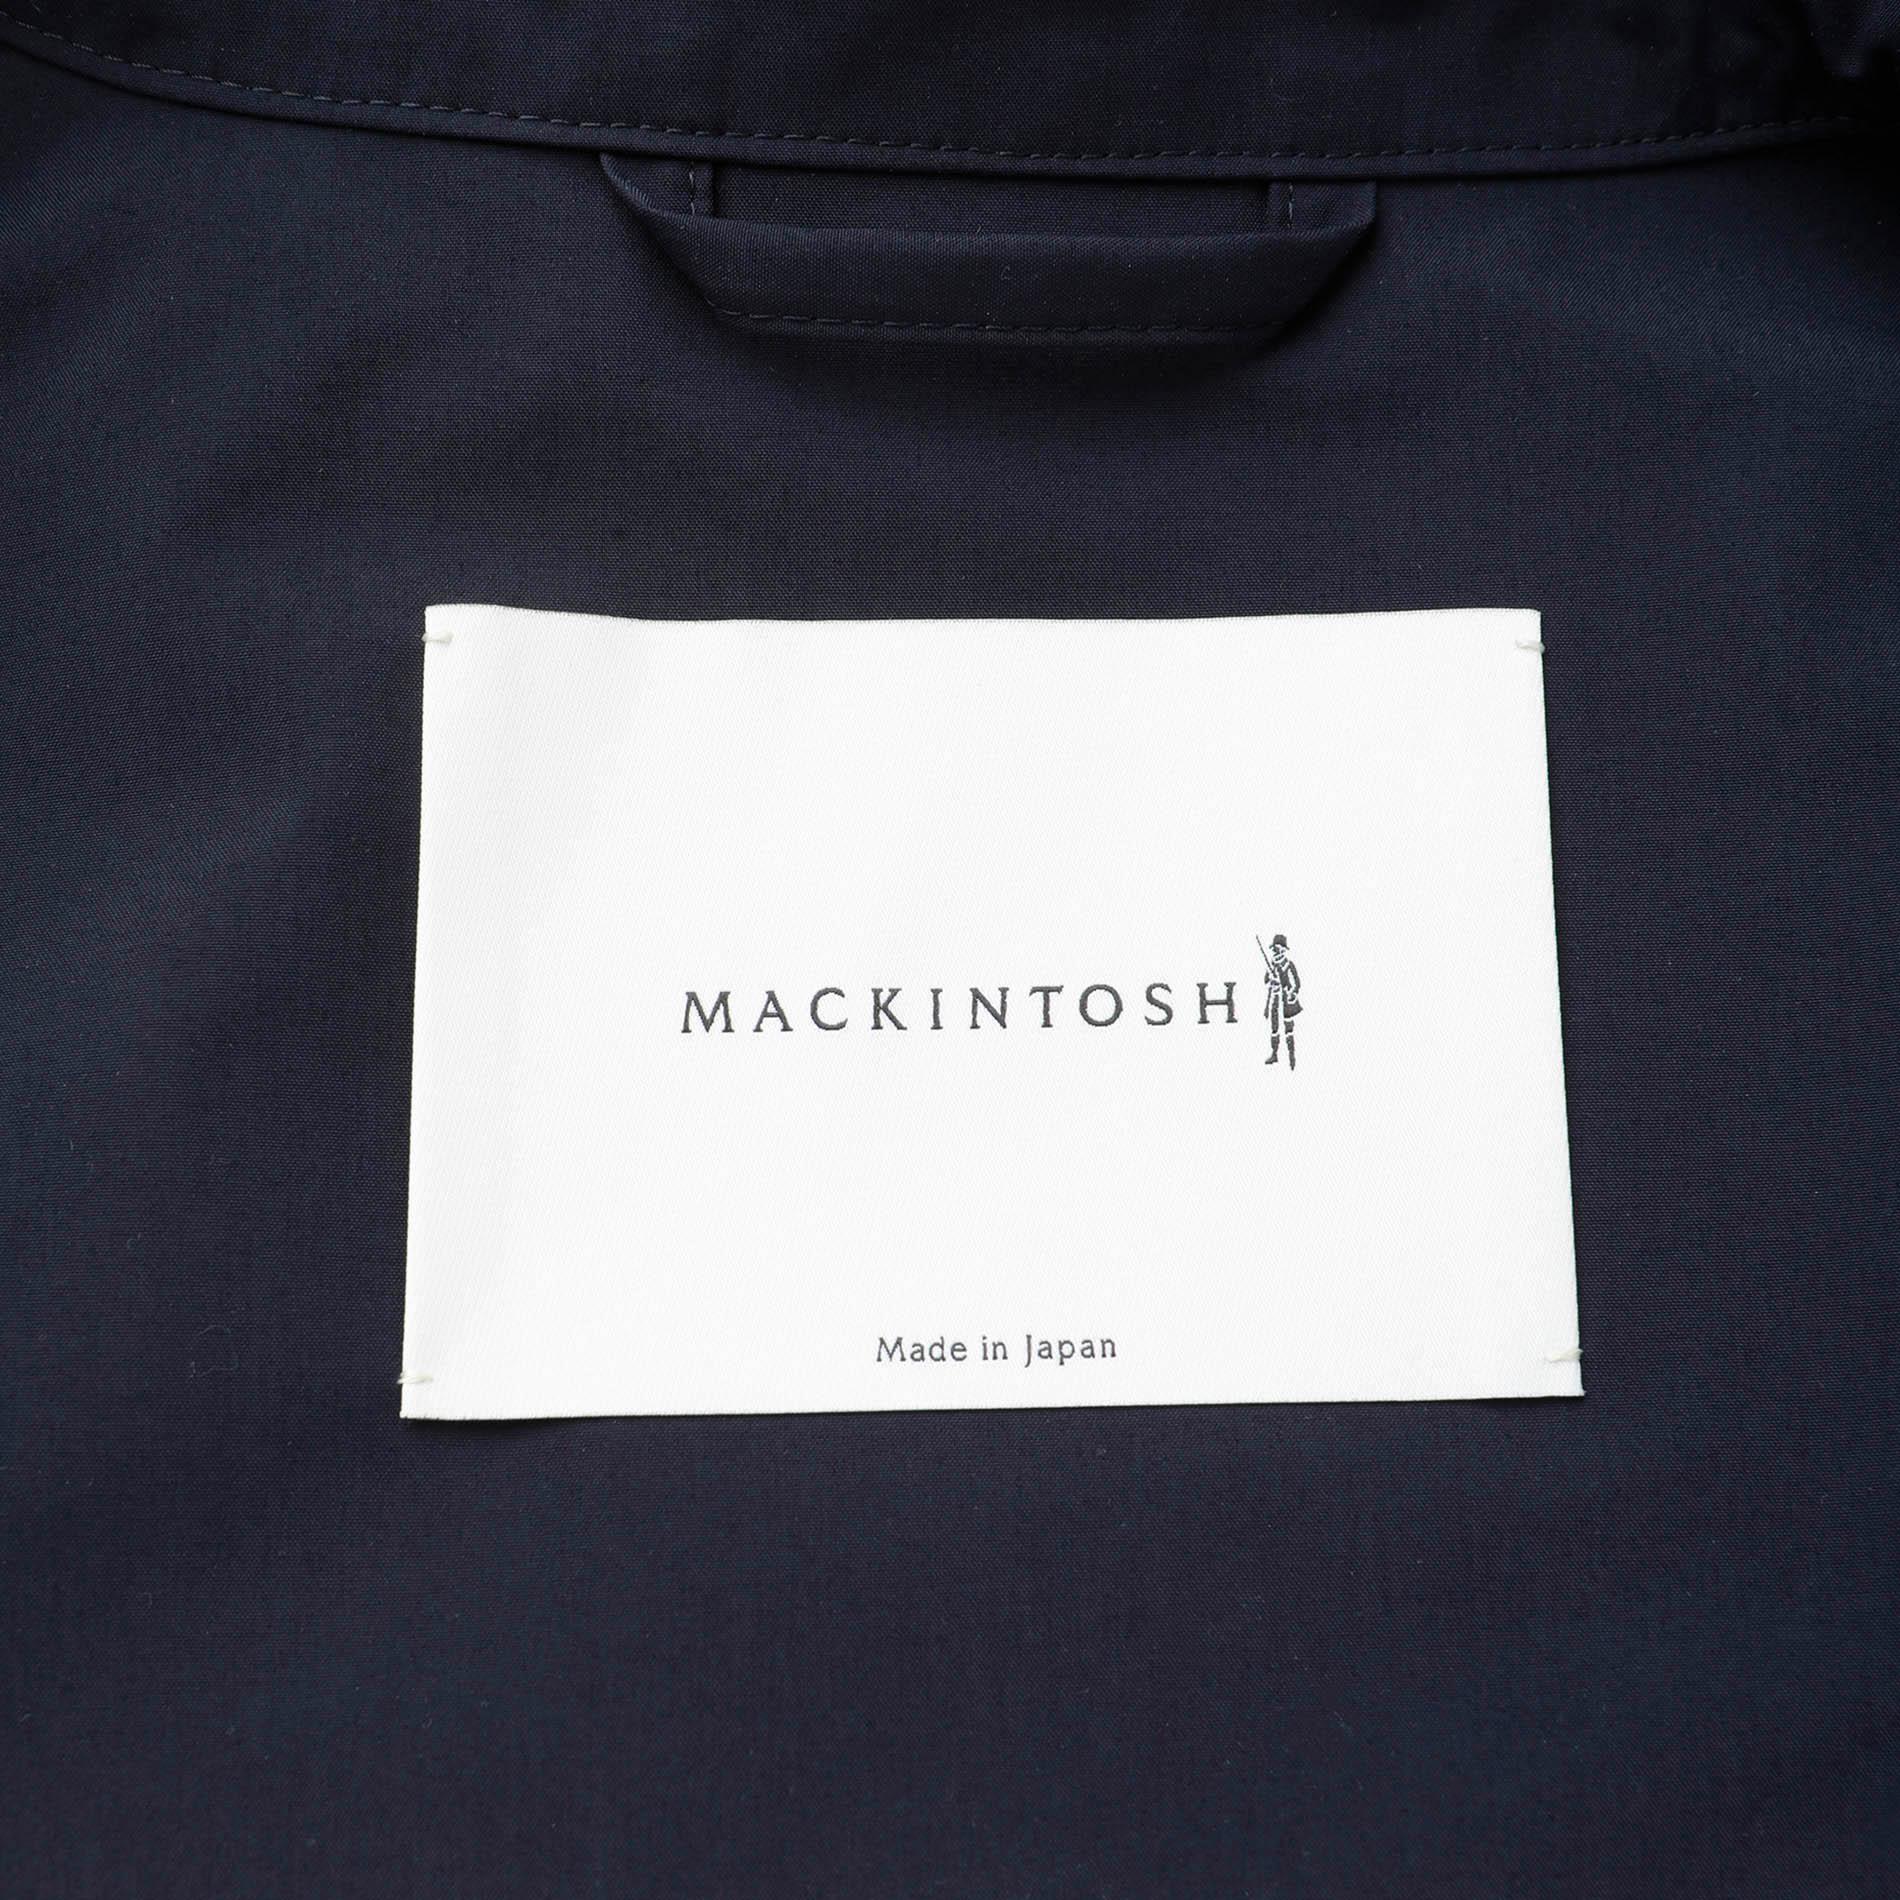 【MACKINTOSH】【DUNKELD】テクニカルステンカラーコート